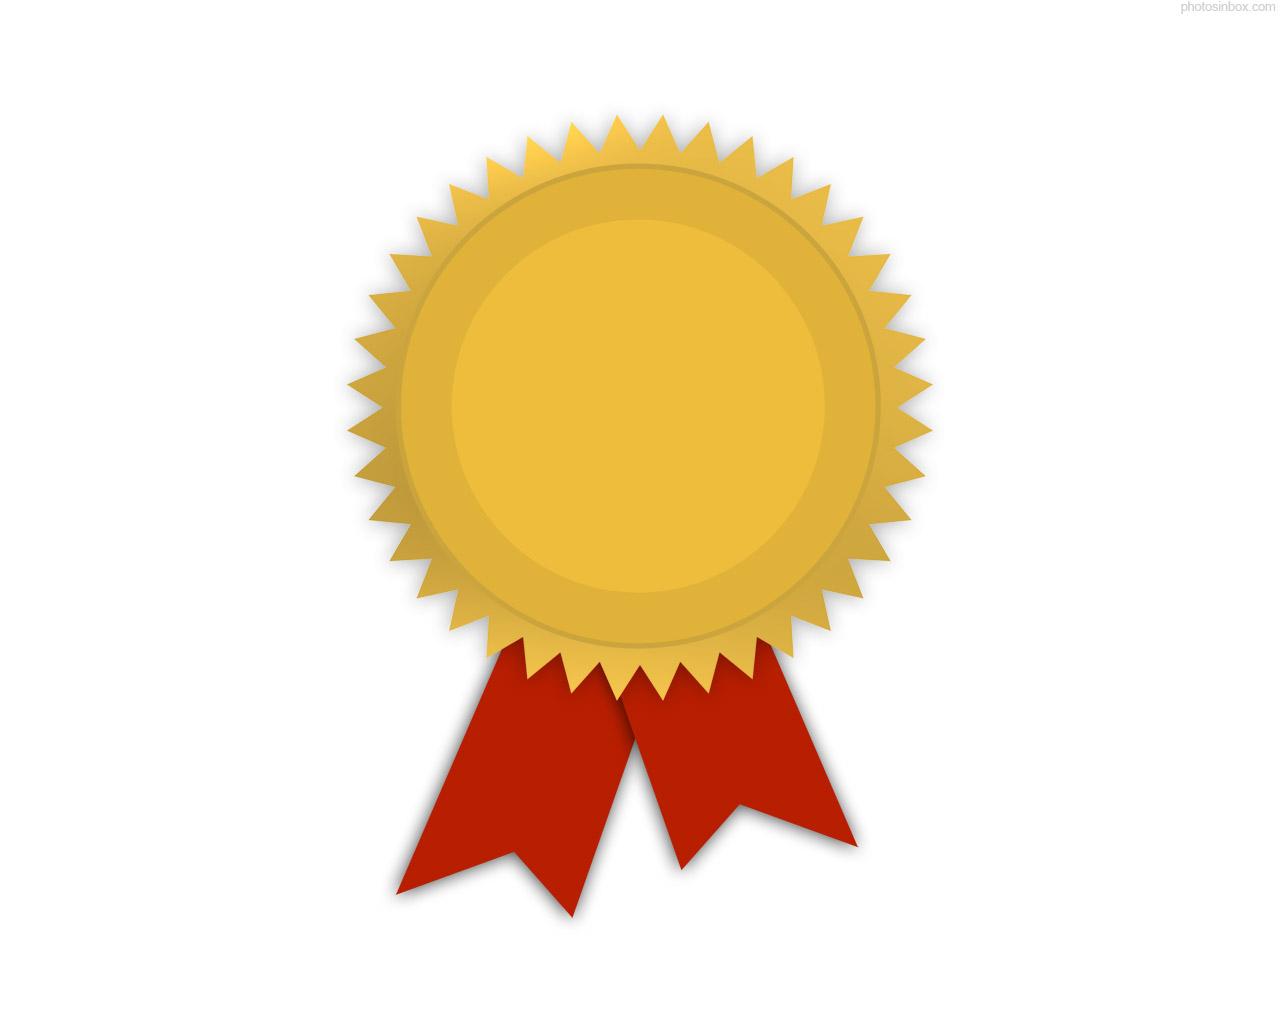 Prize Medallion Clipart.